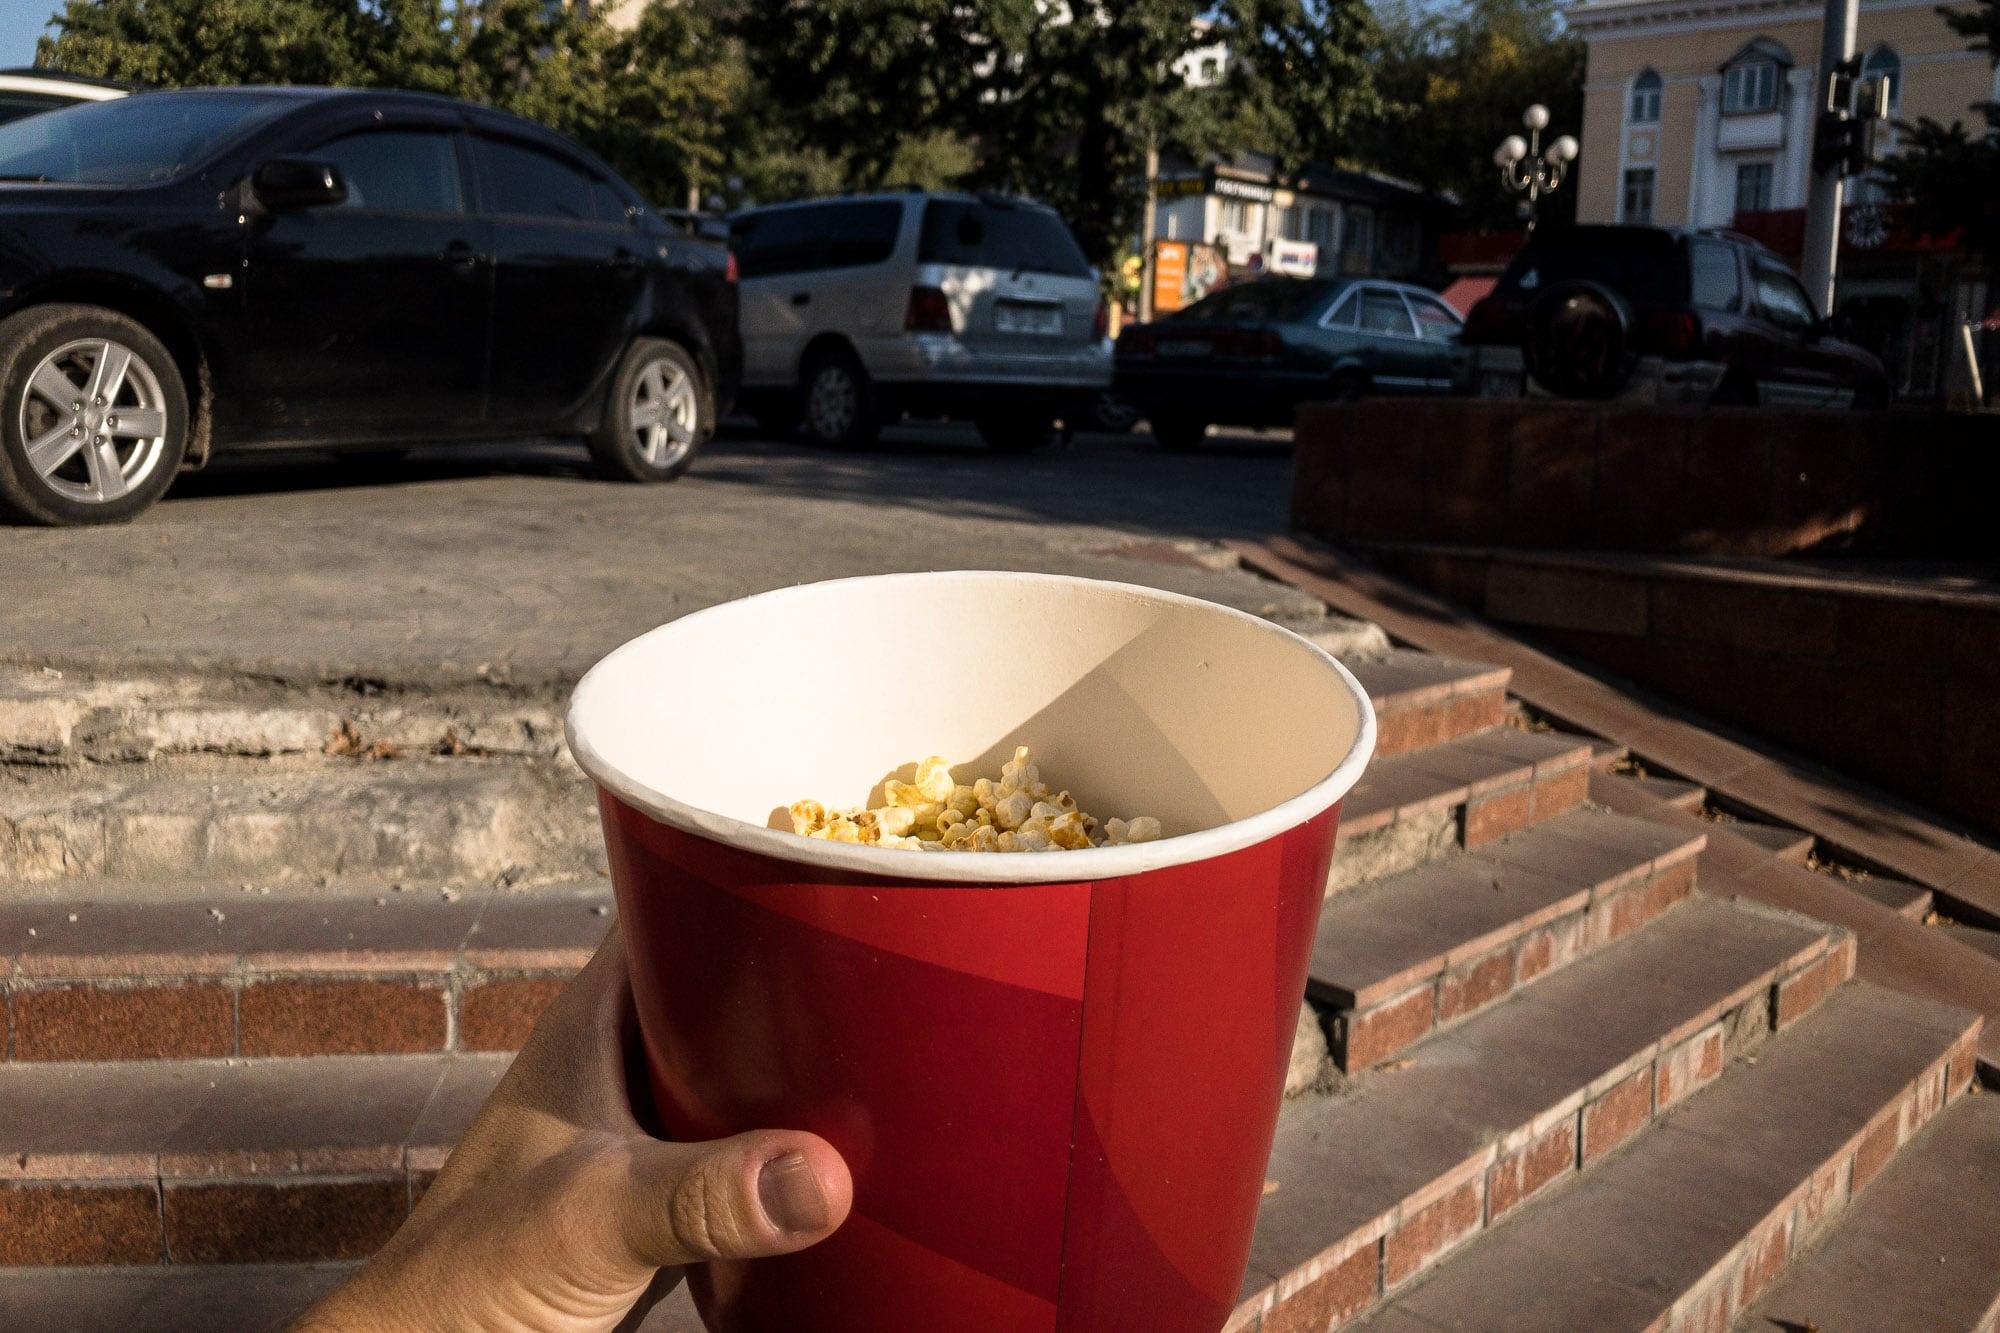 less popcorn